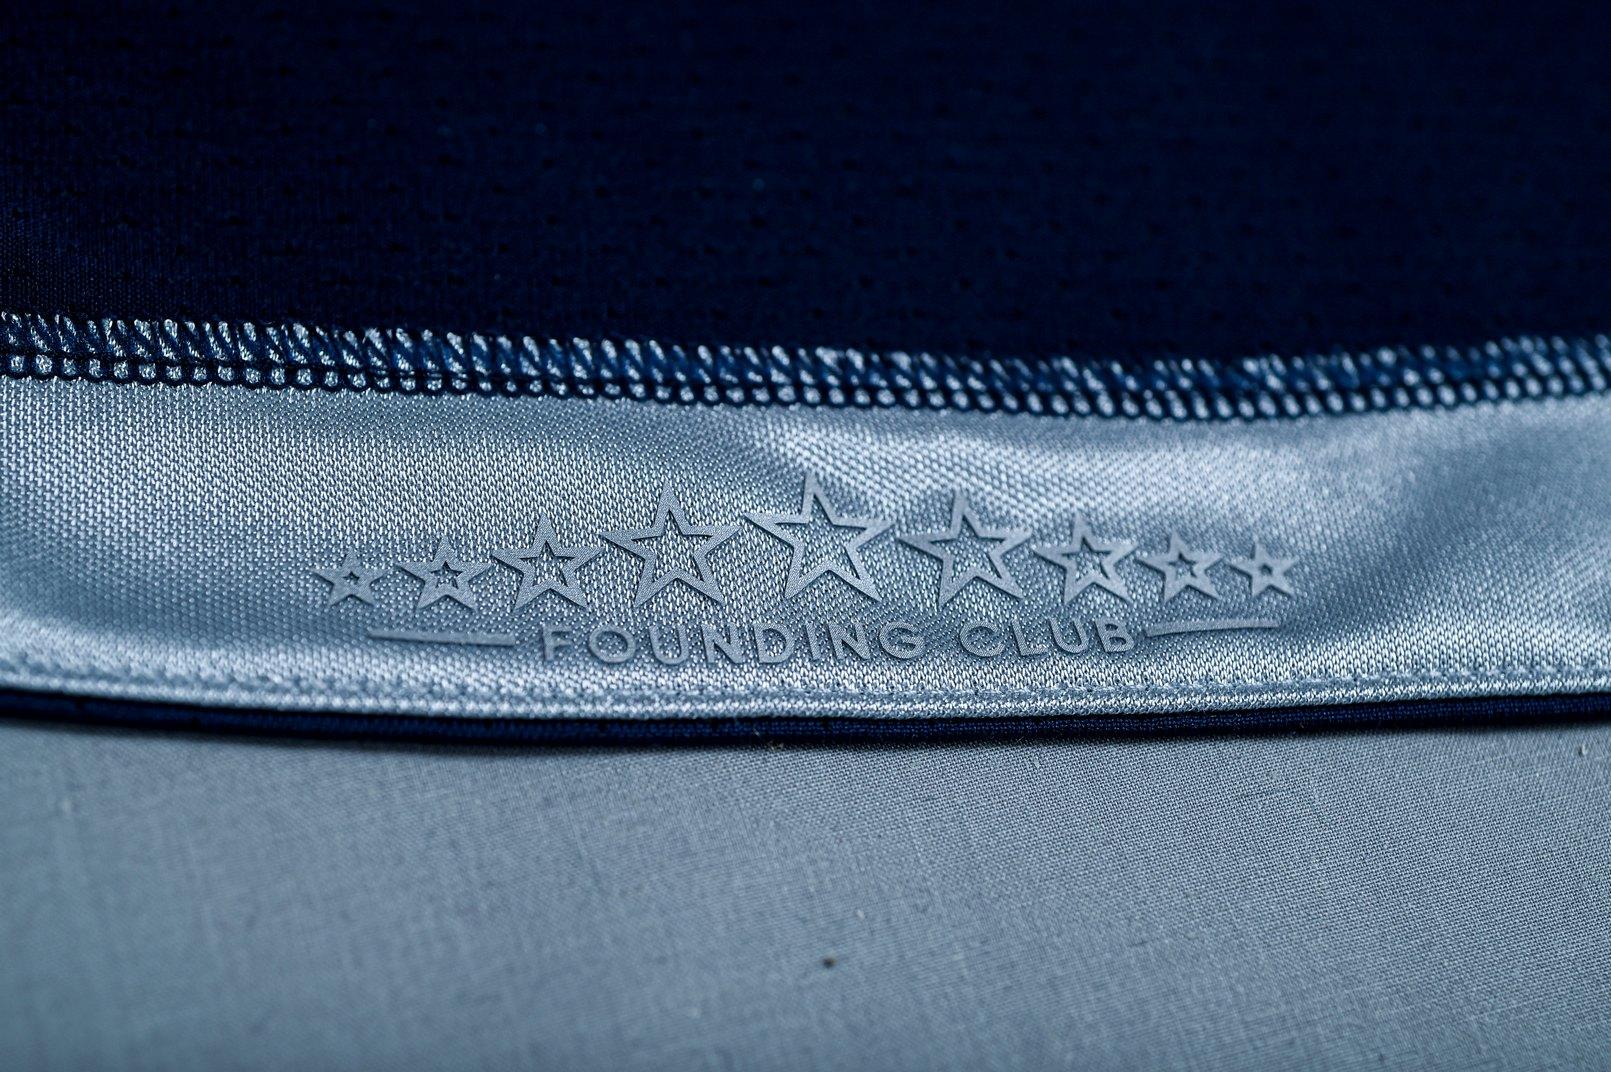 Camiseta suplente Adidas del Sporting Kansas City 2020/21 | Imagen Web Oficial